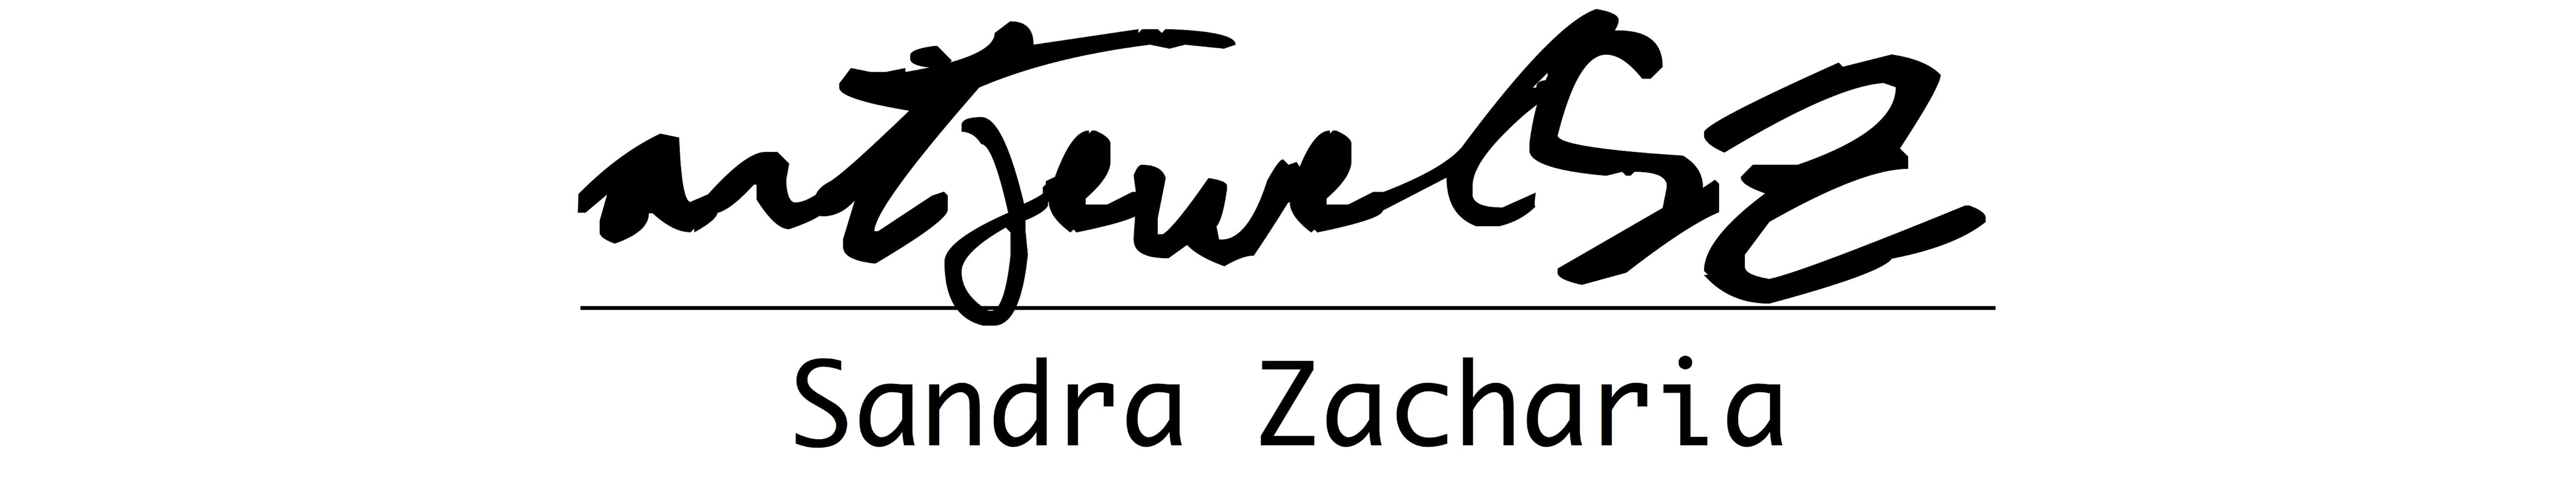 Sandra Zacharia's Signature